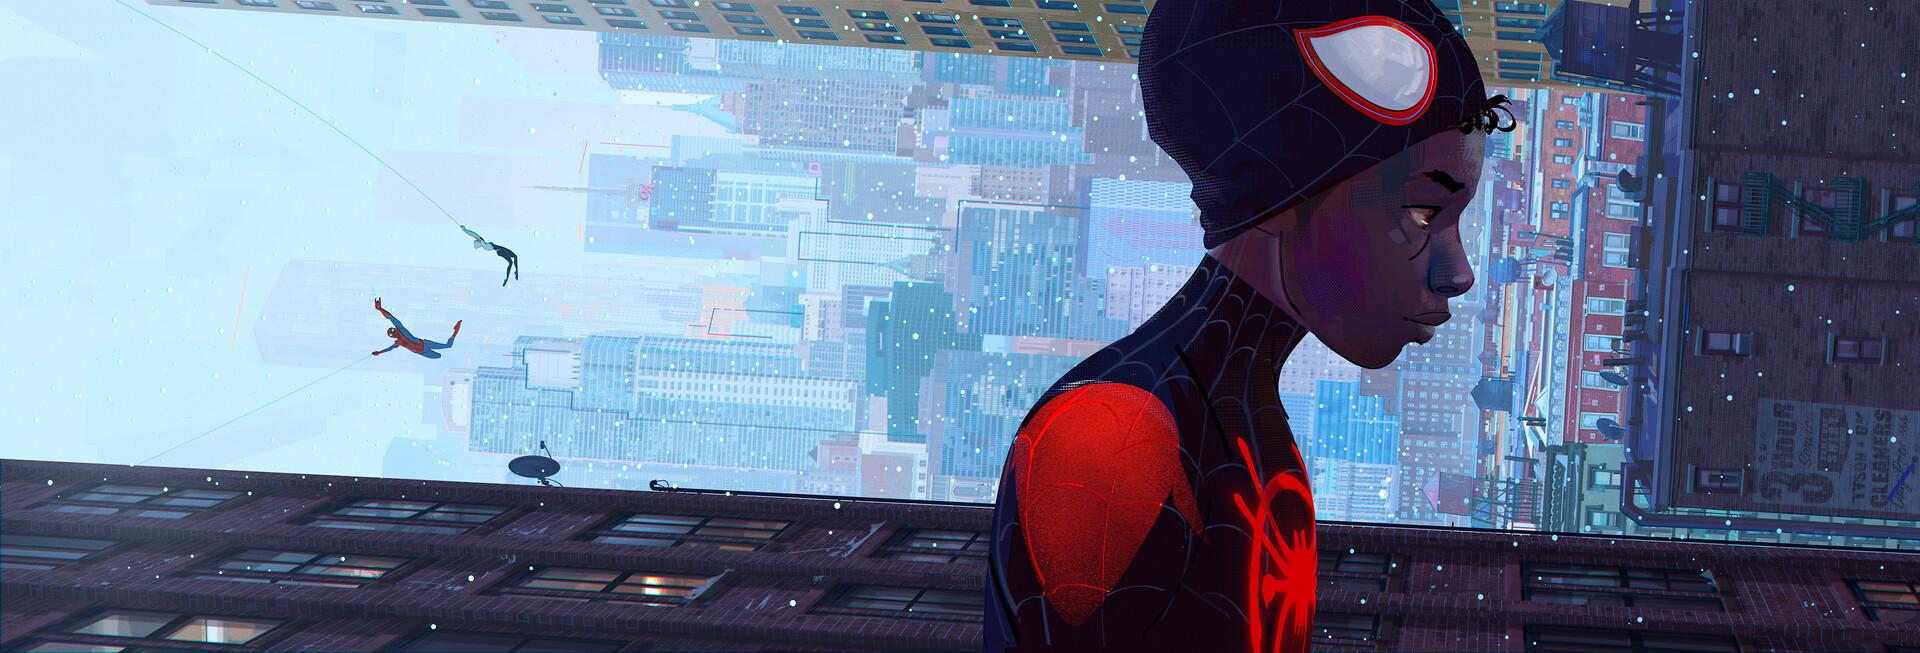 Patrick o keefe spiderverse cover final ok